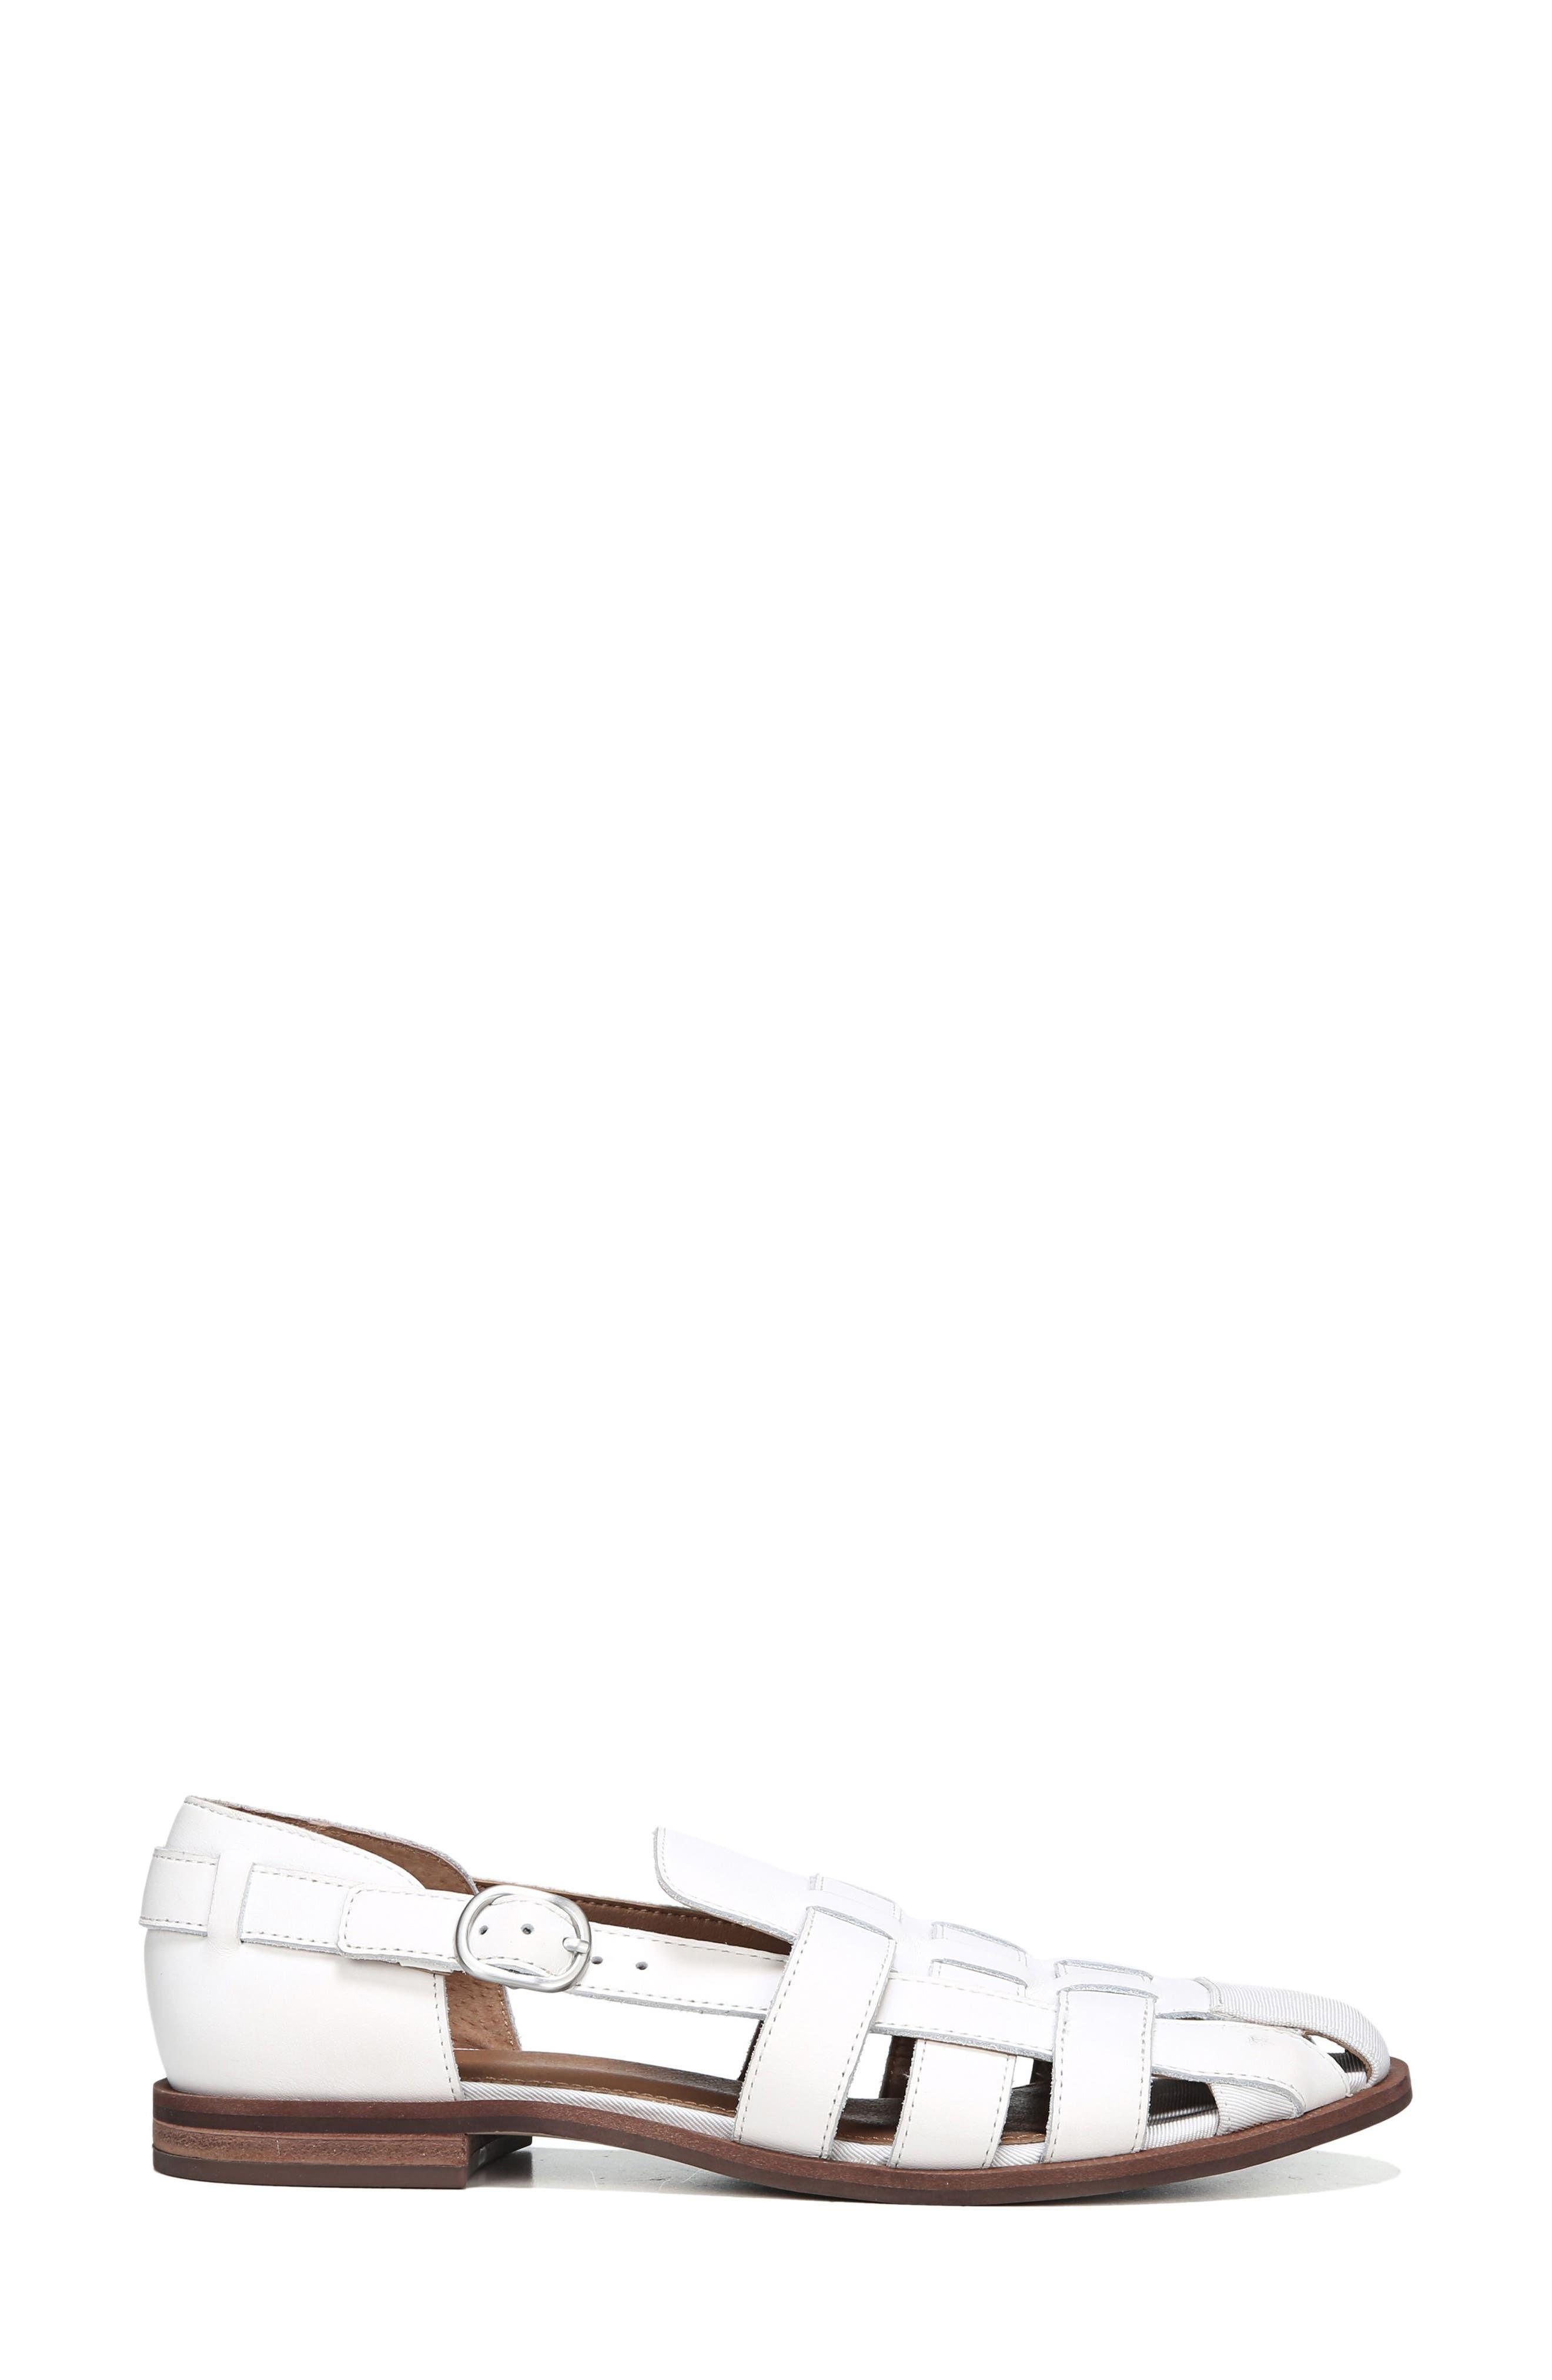 Lulu Fisherman Sandal,                             Alternate thumbnail 3, color,                             Bright White Leather